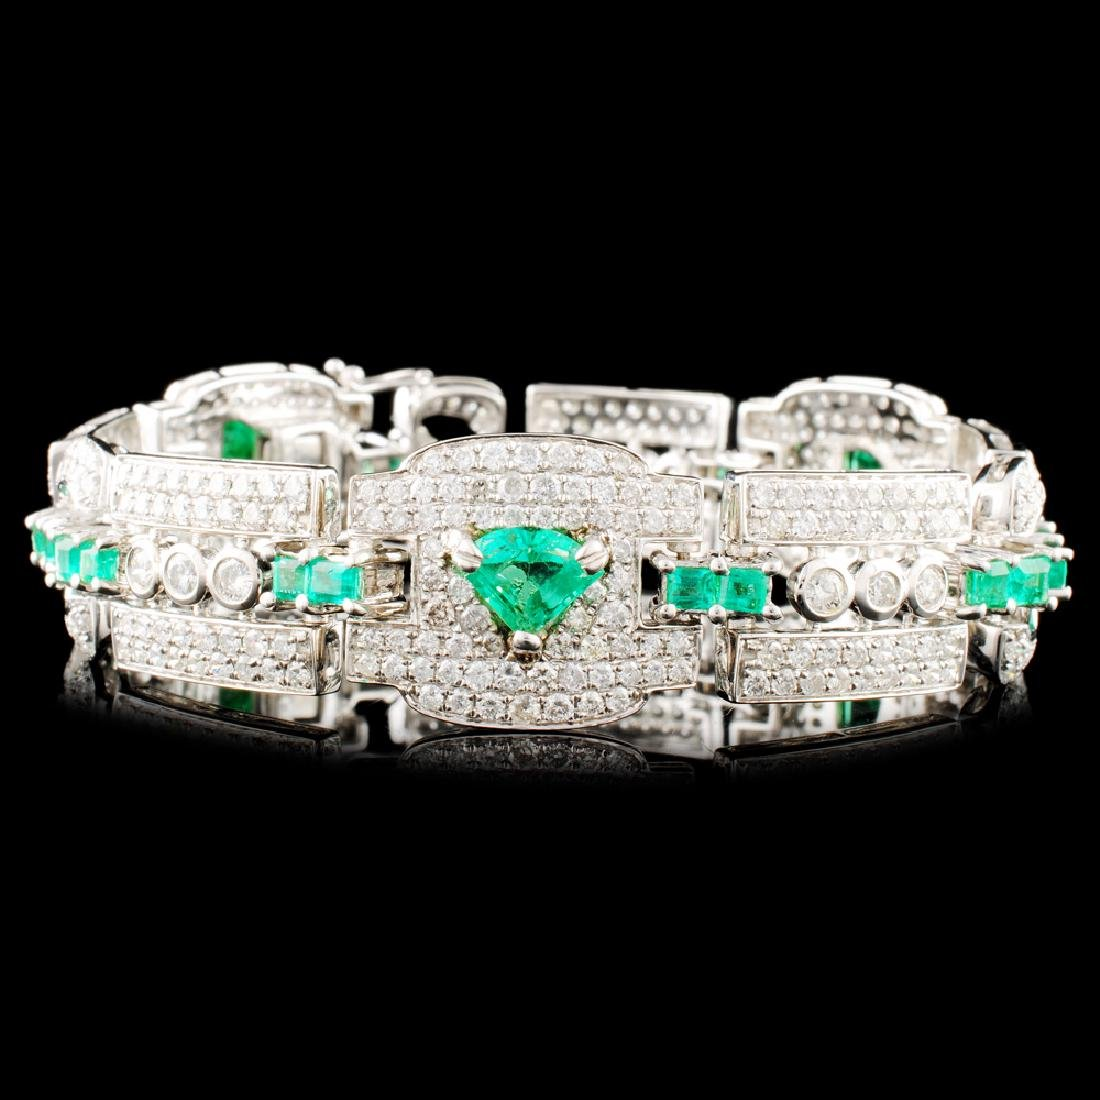 18K Gold 4.77ct Emerald & 7.70ctw Diamond Bracelet